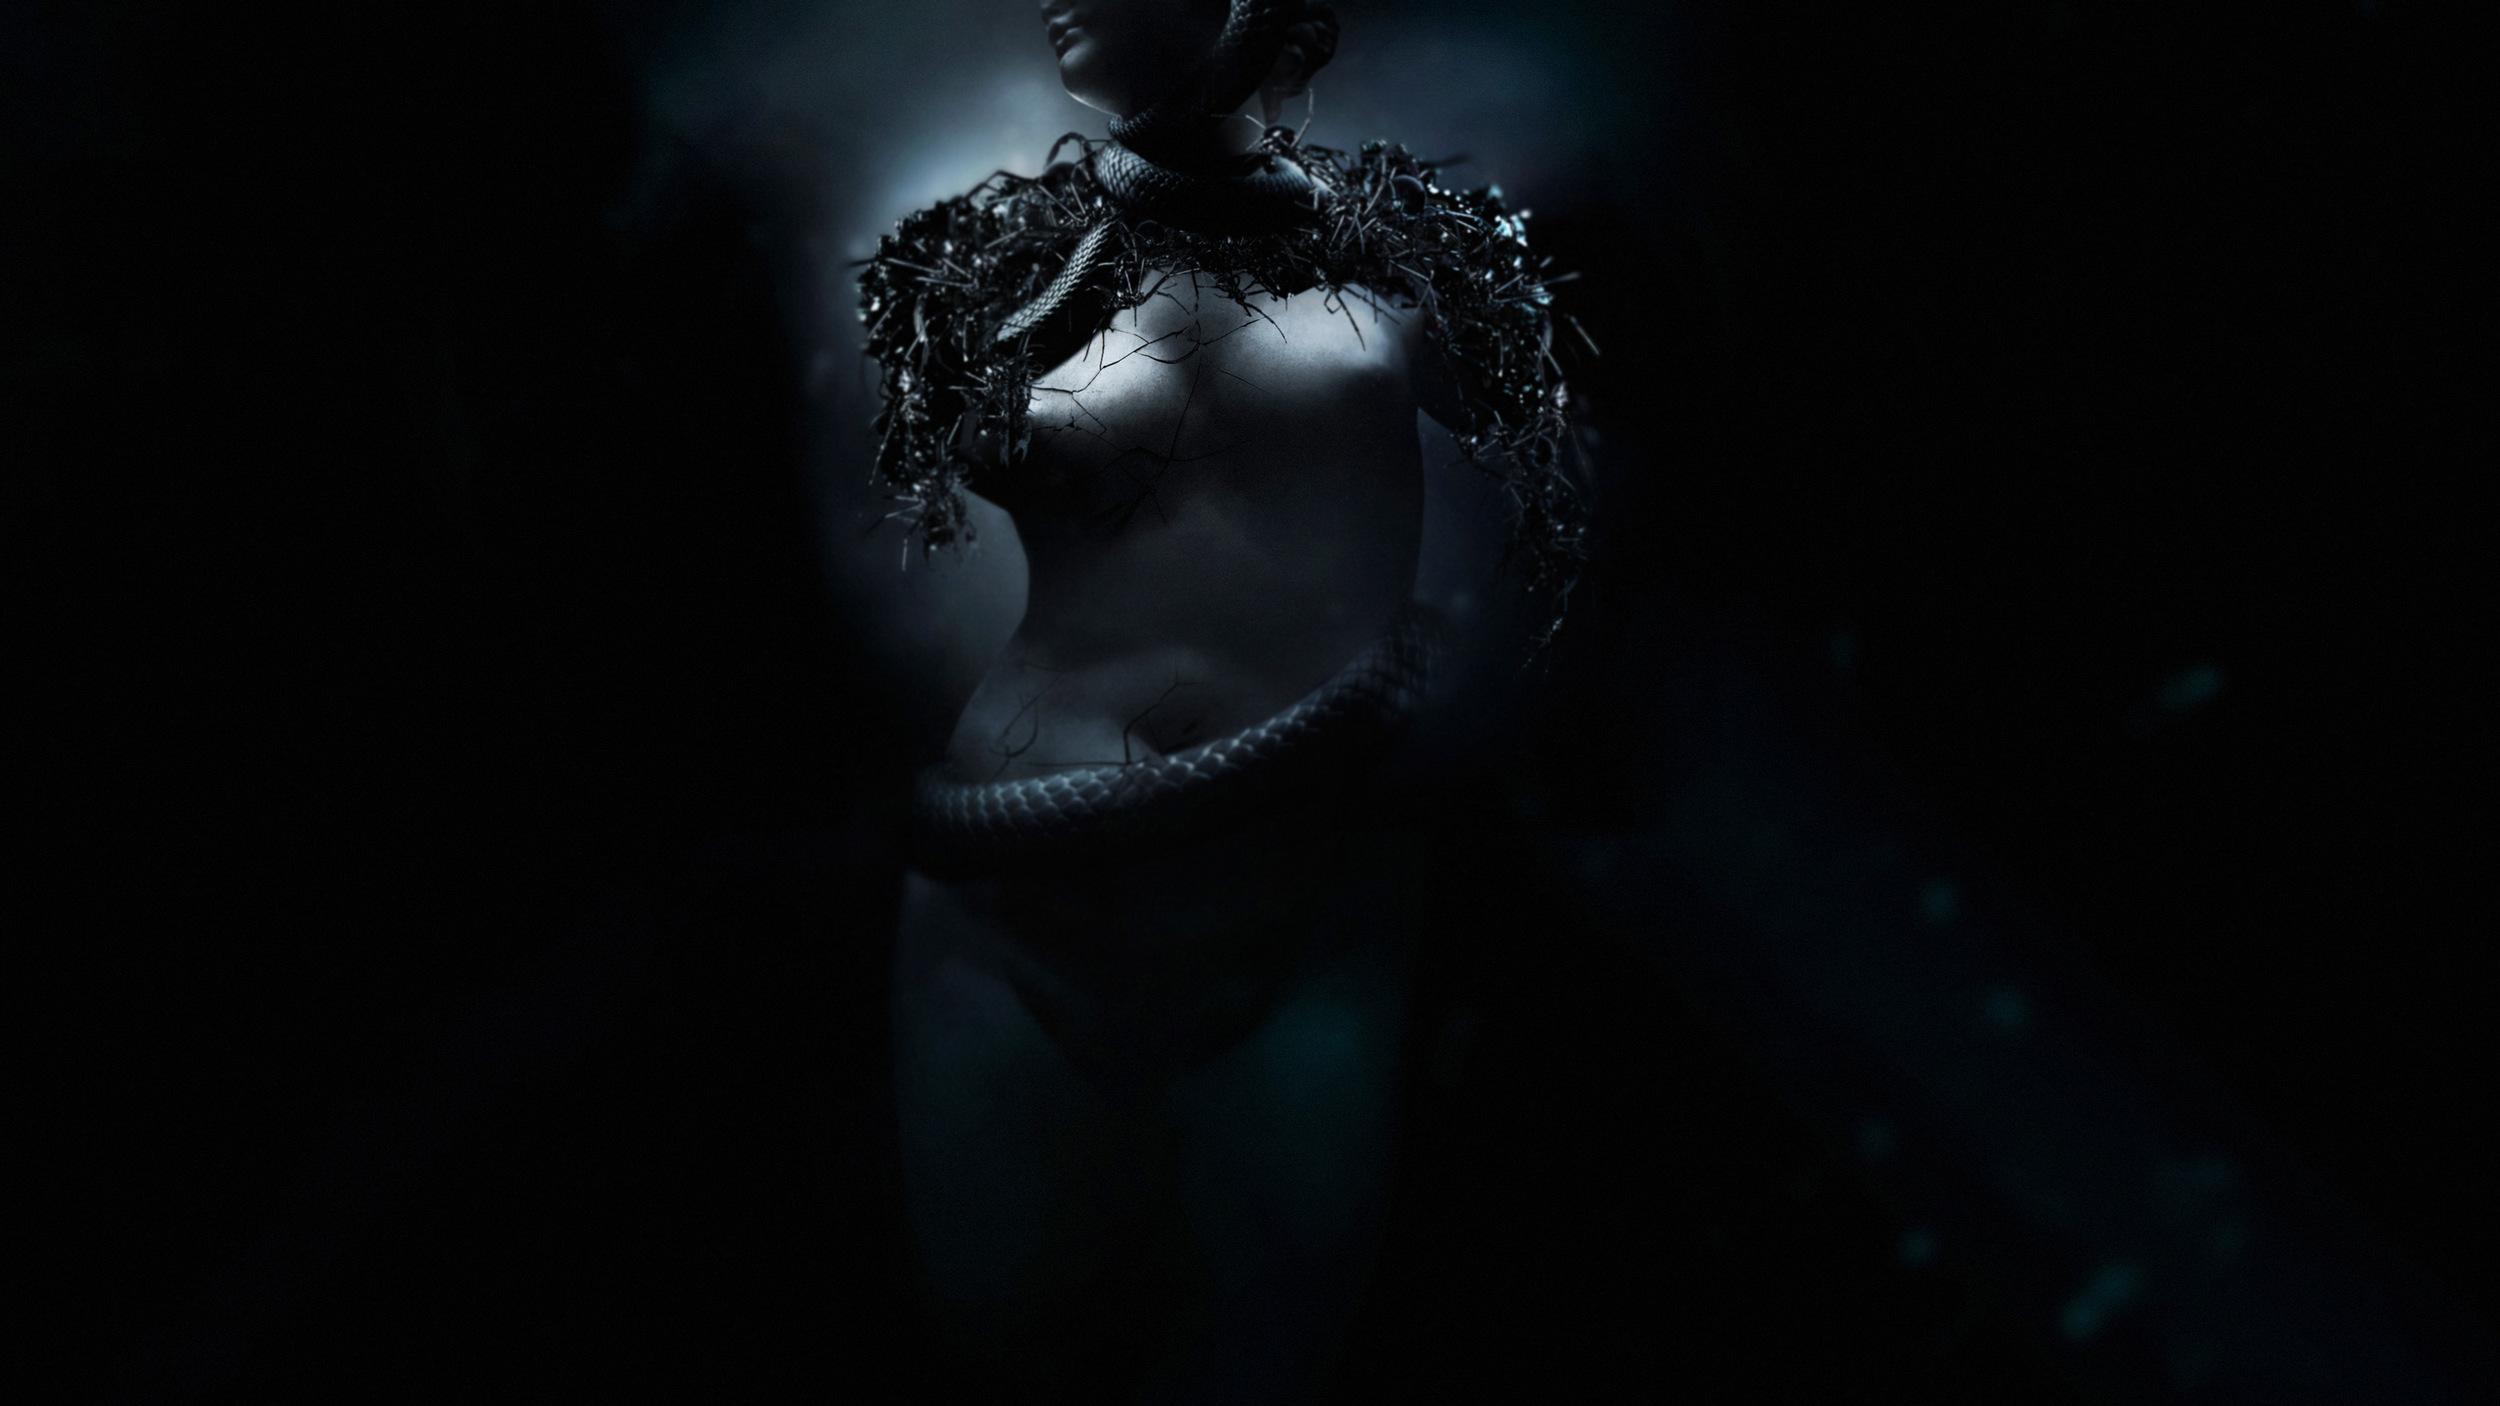 Lauren-Indovina-Penny-Dreadful-Titles-PSYOP-Concept-Art-Armour.jpg